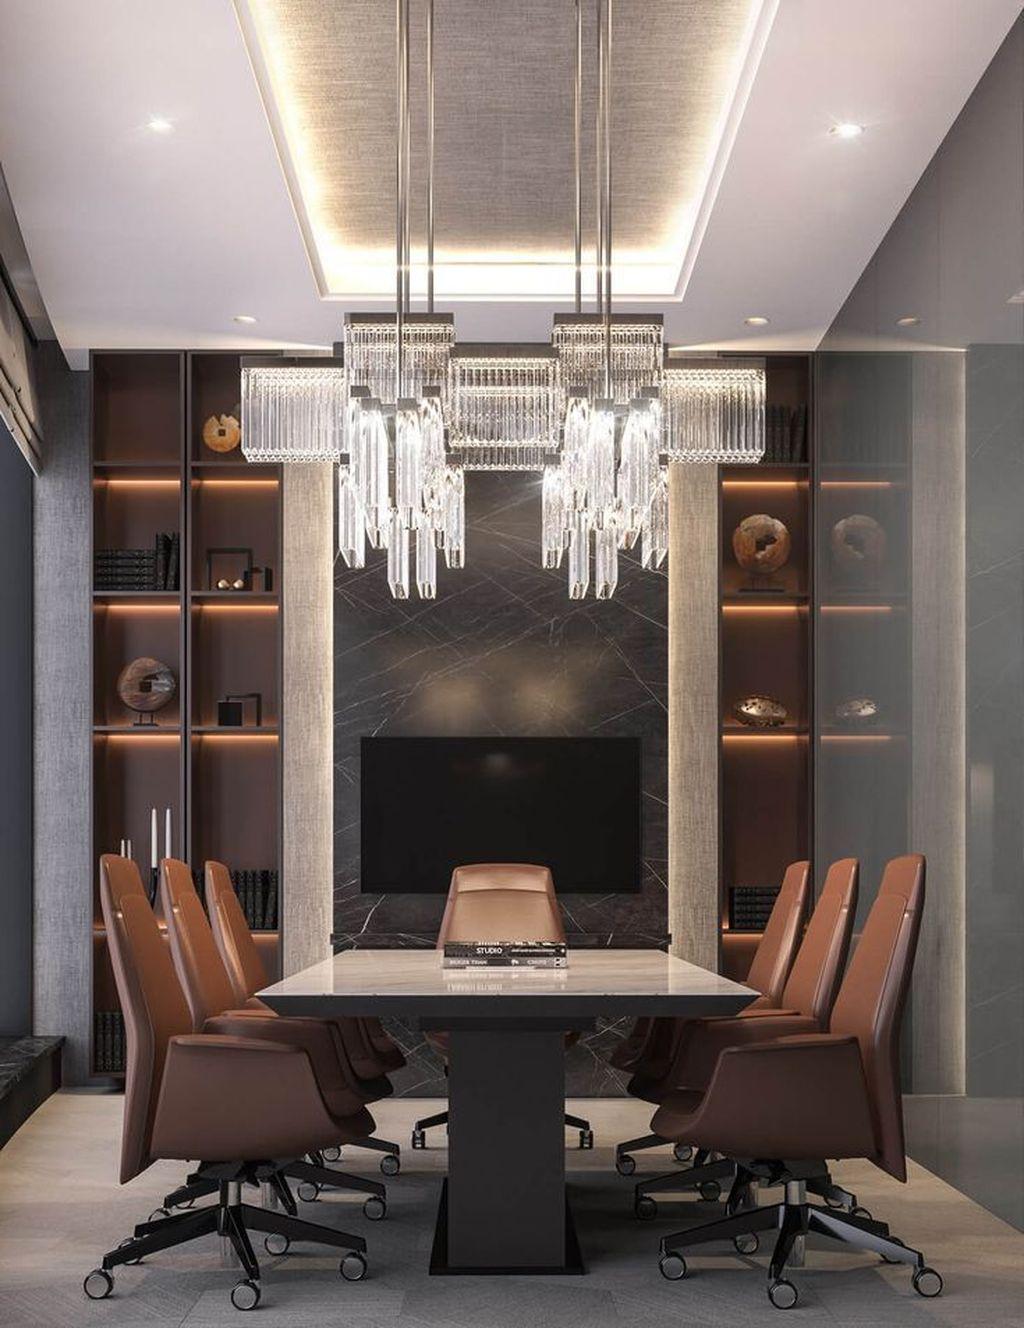 Gorgeous Modern Office Interior Design Ideas You Never Seen Before 15